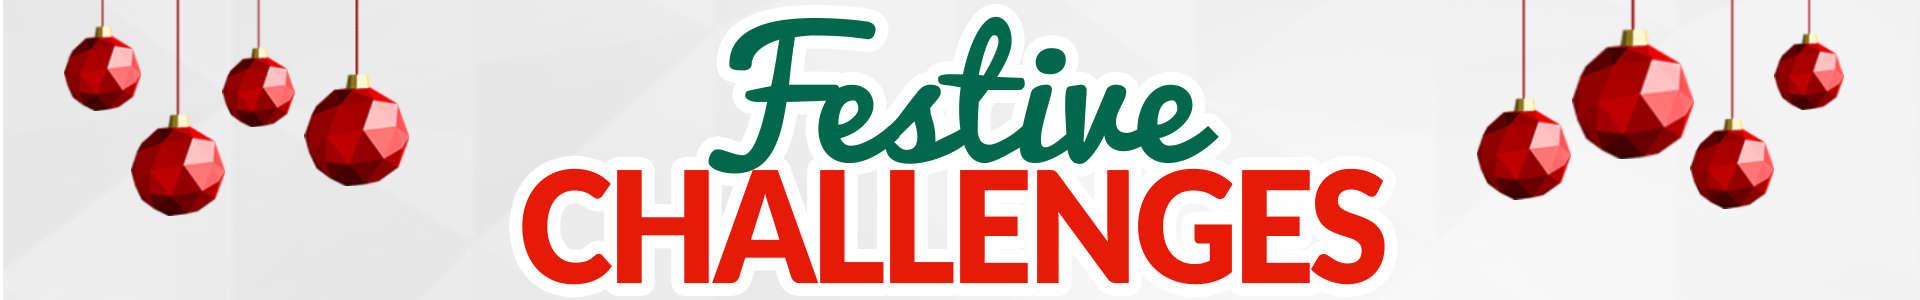 Festive_Challenges_1920x300